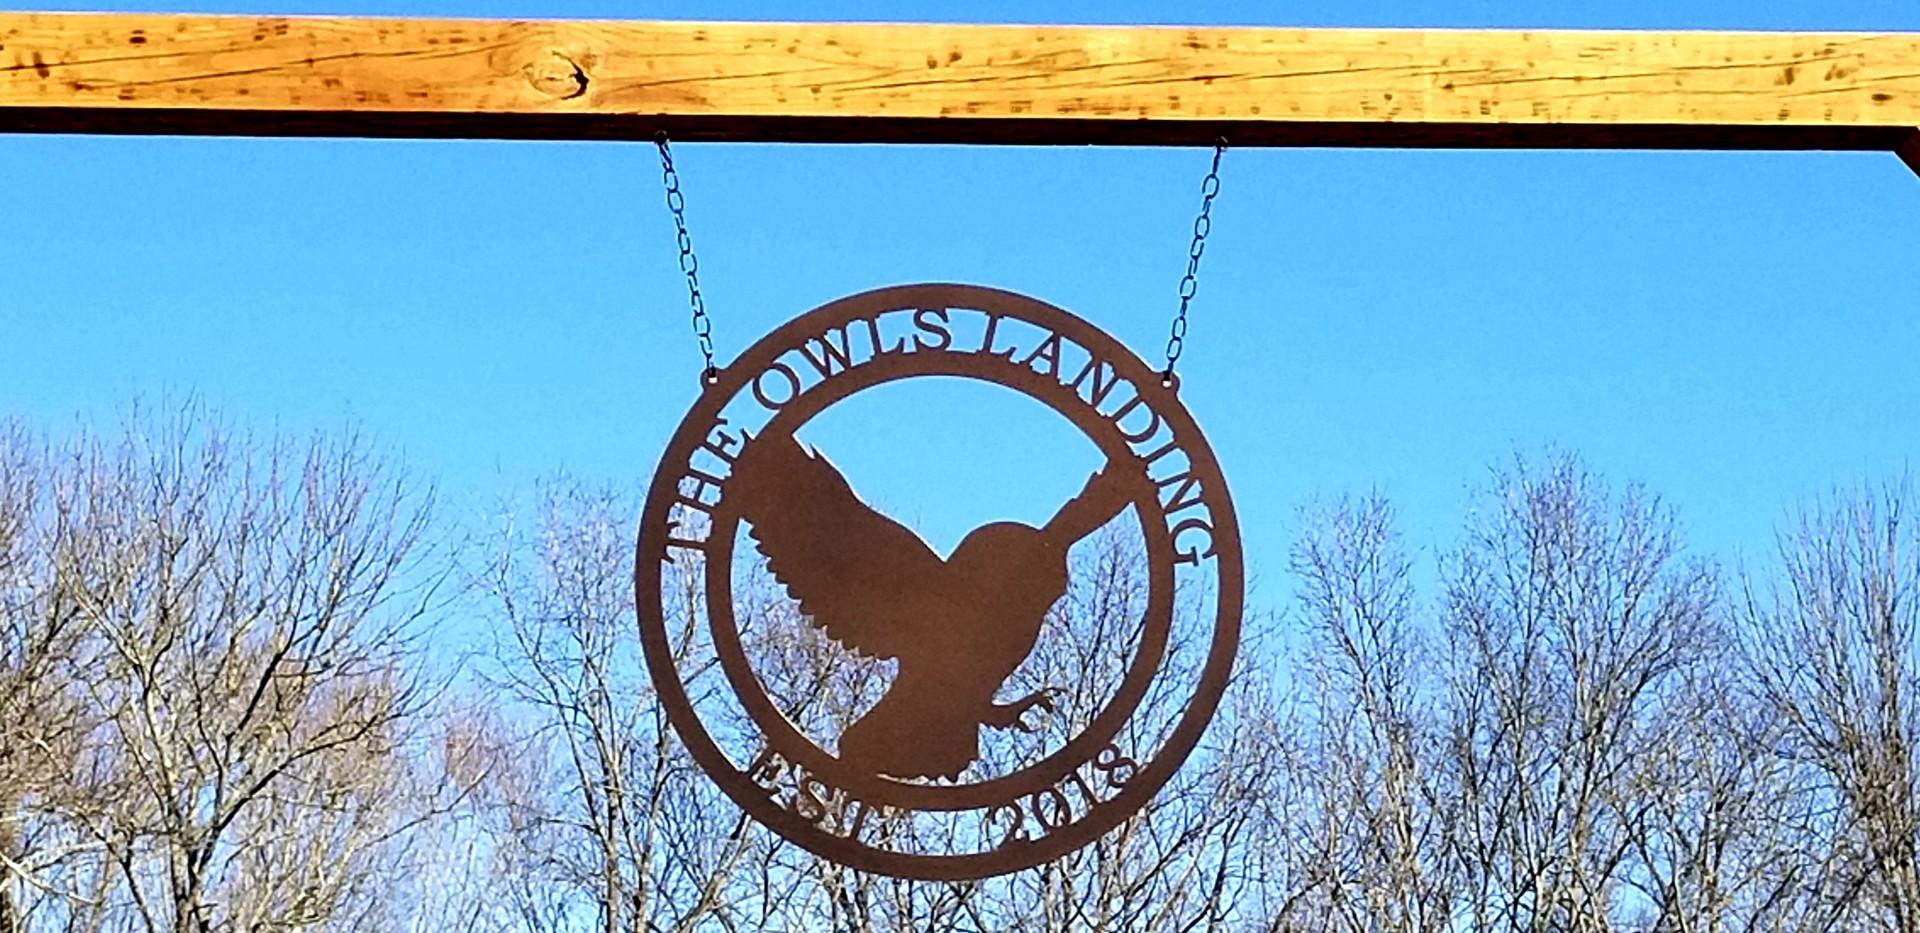 The Owls' Landing Entrance